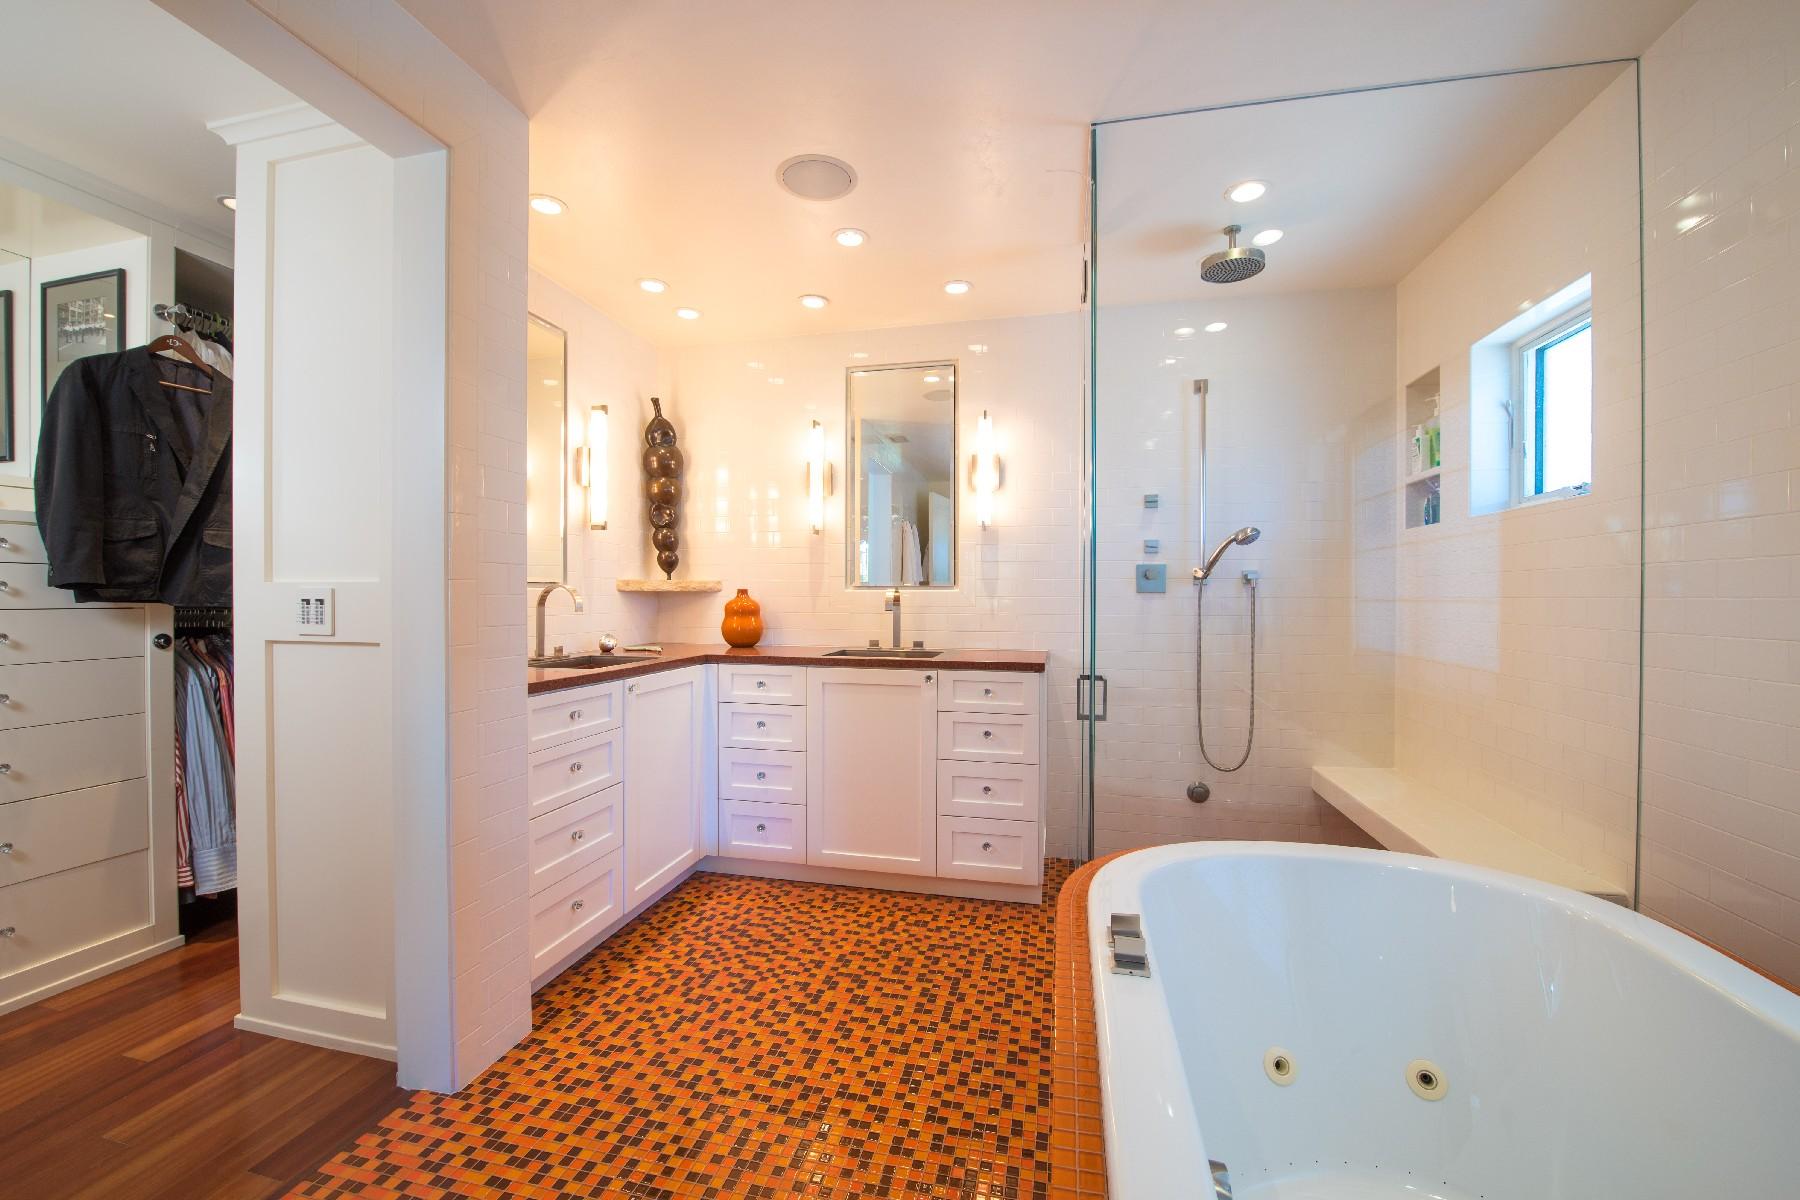 Additional photo for property listing at 734 Glorietta Boulevard 734 Glorietta Bouldevard Coronado, California 92118 United States